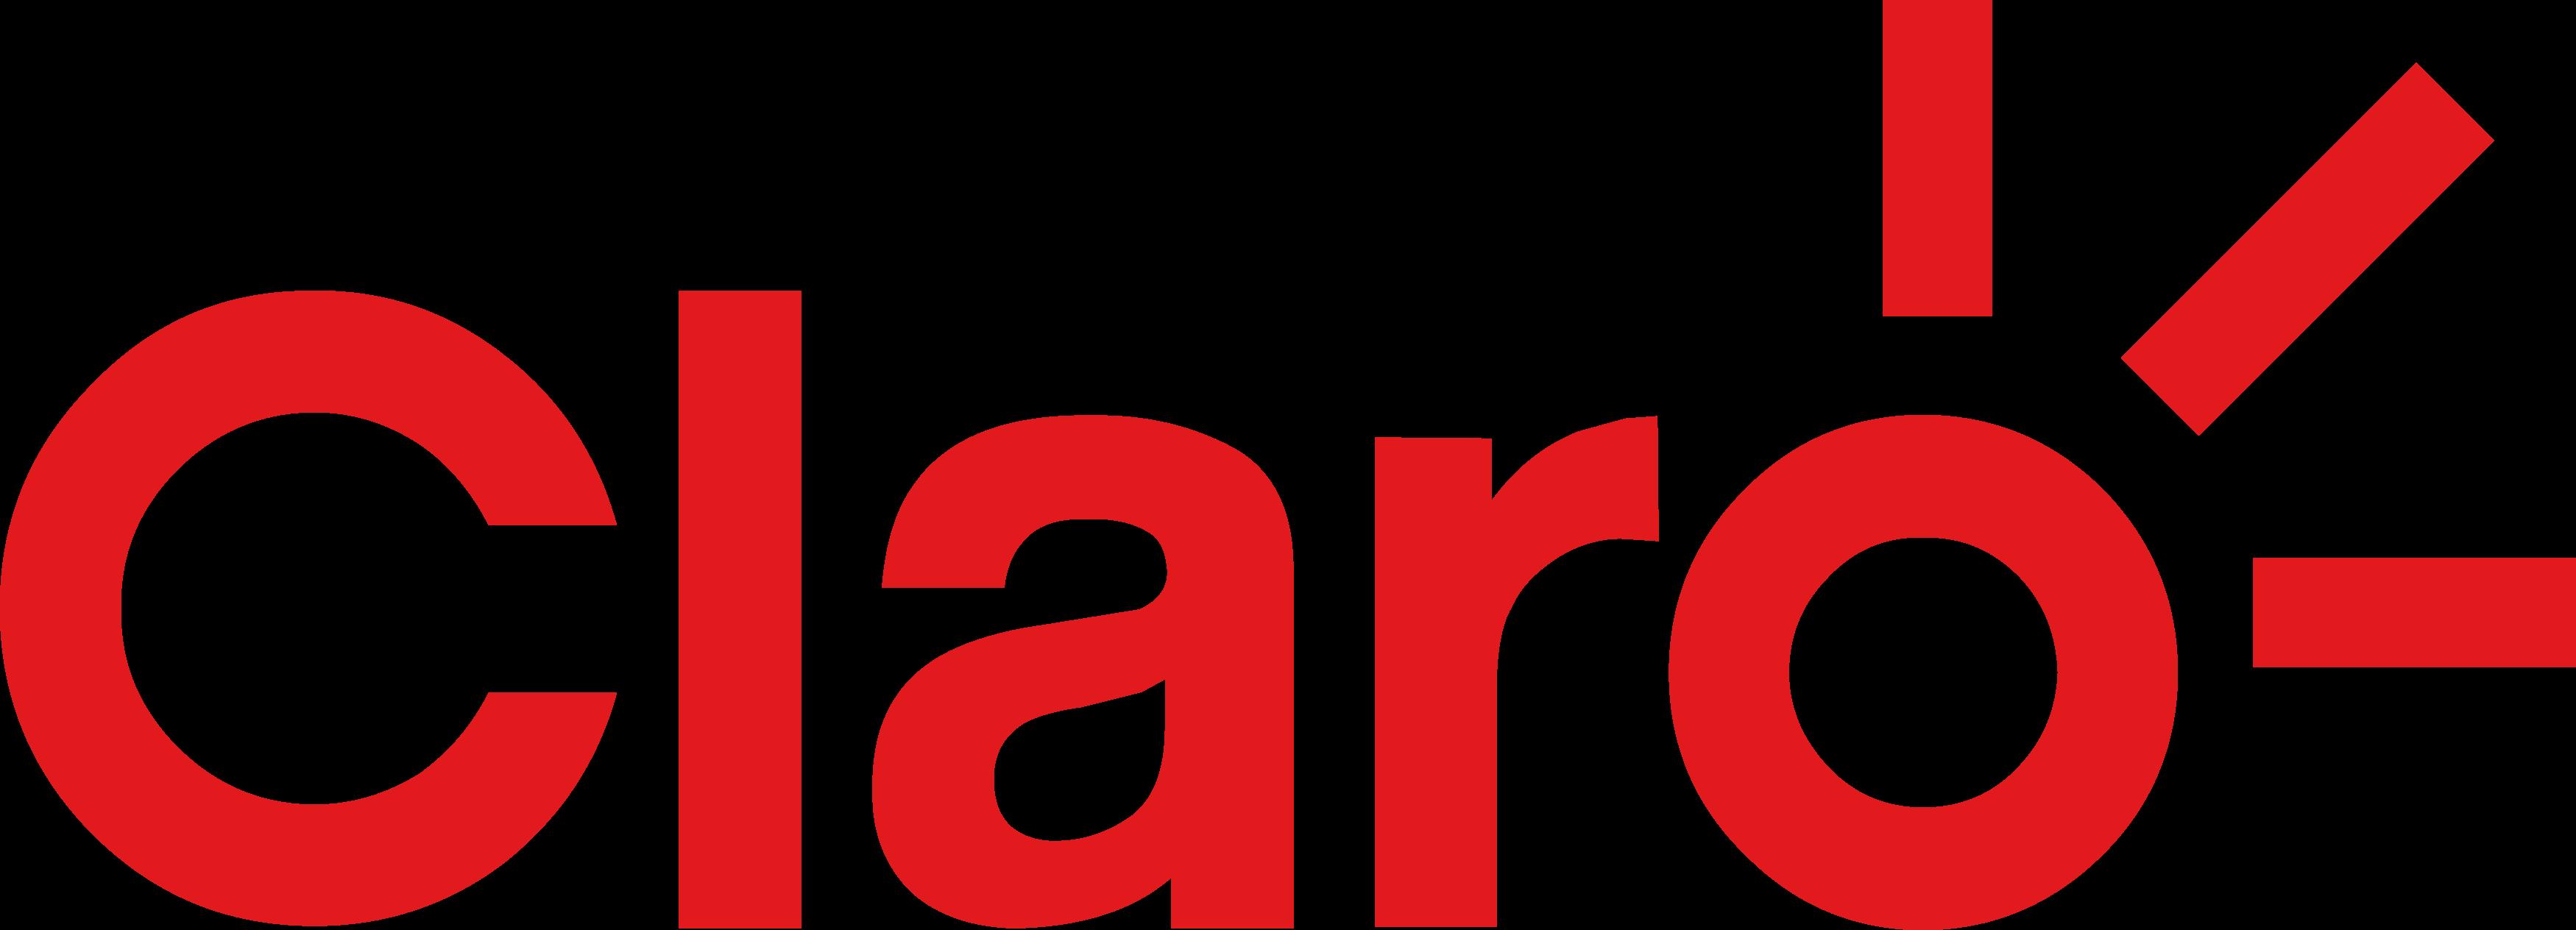 claro-hdtv-logo-1